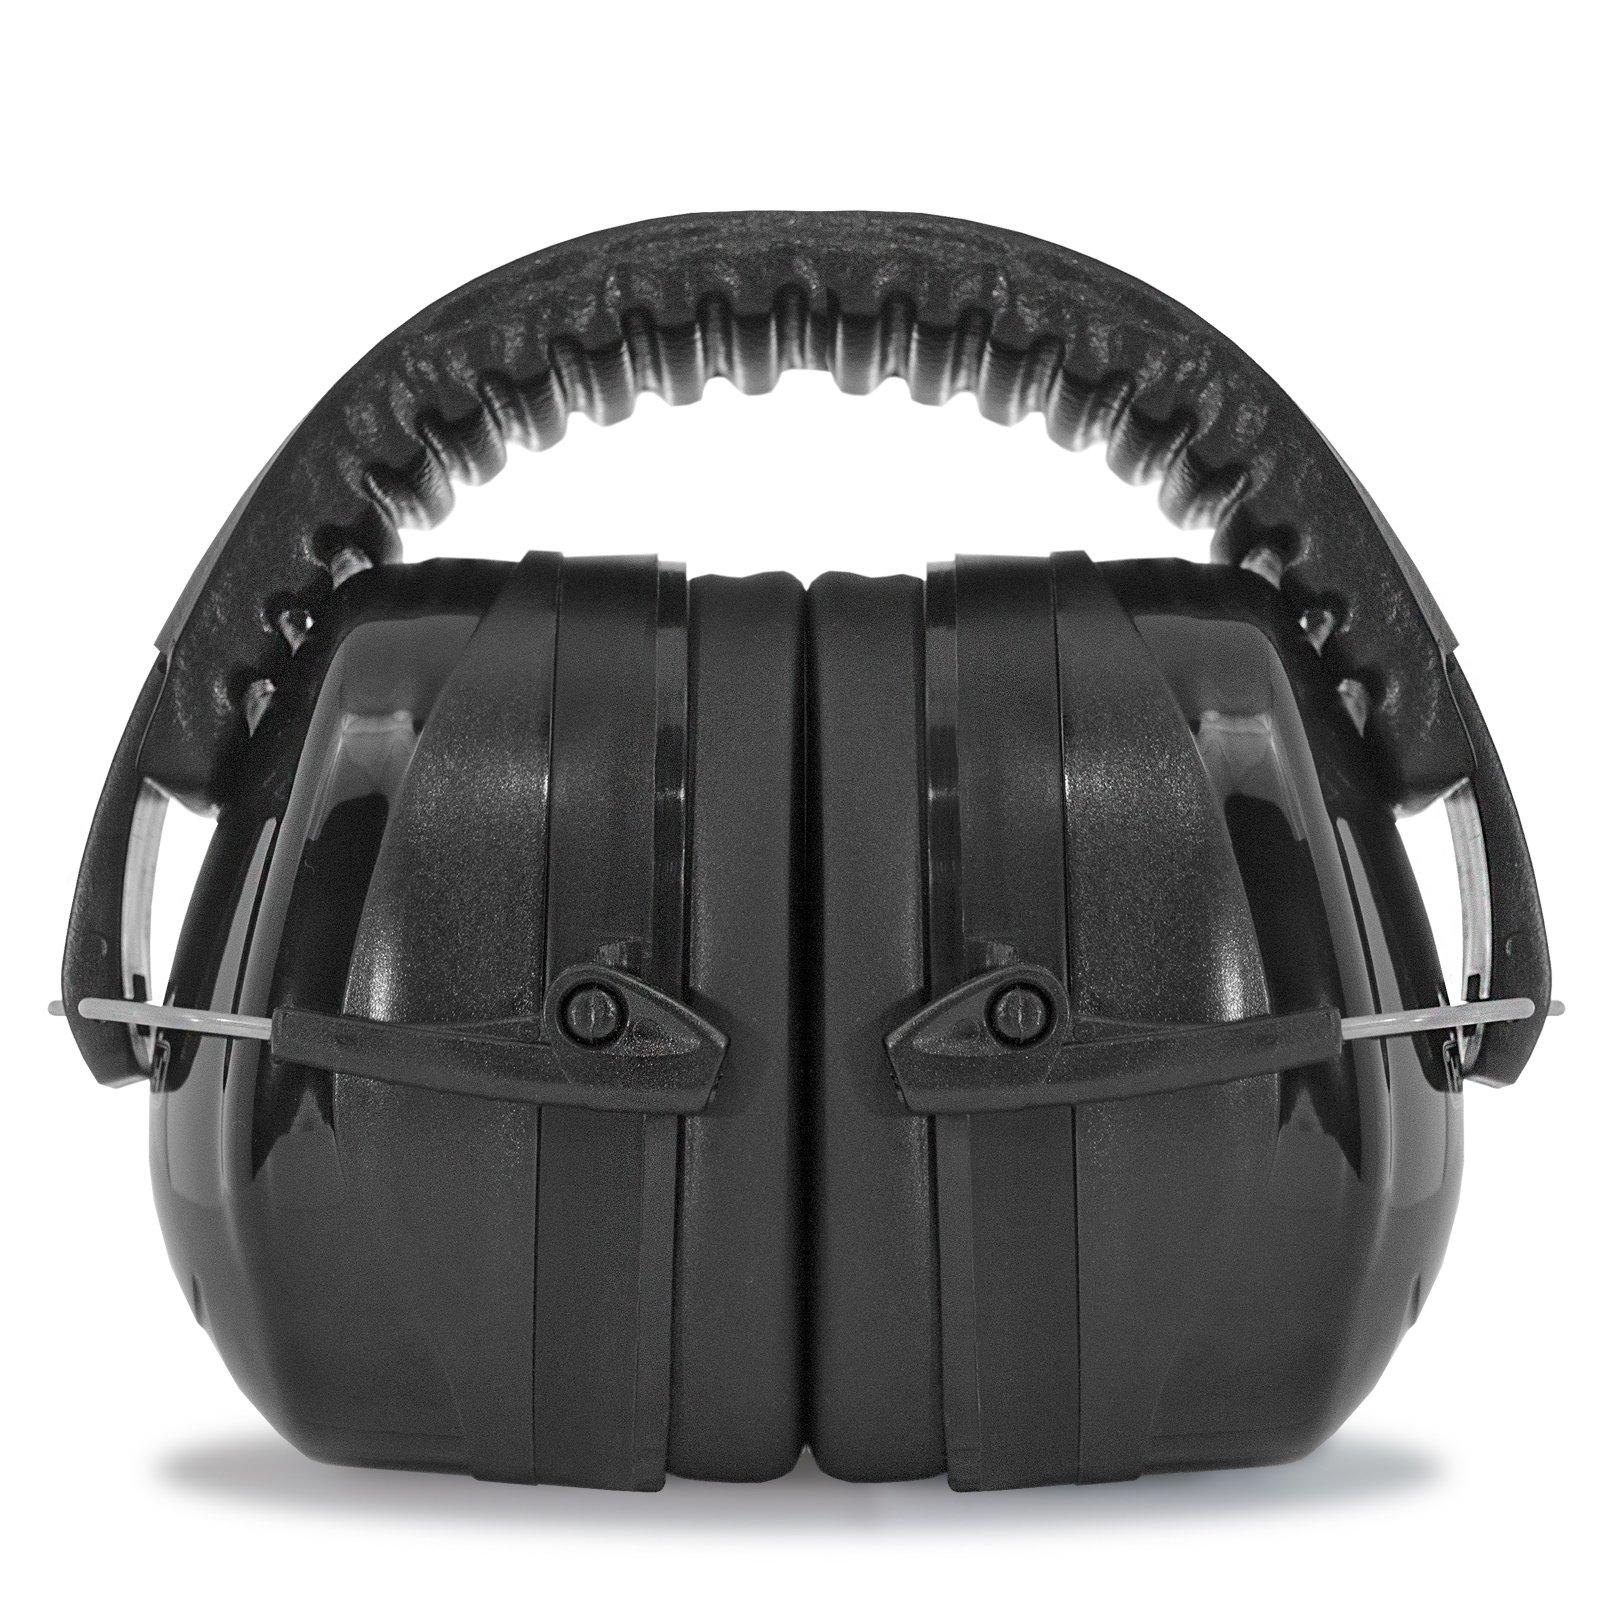 JORESTECH EAR MUFF LUXURY STYLE 27 dB NRR Premium Quality (Black)